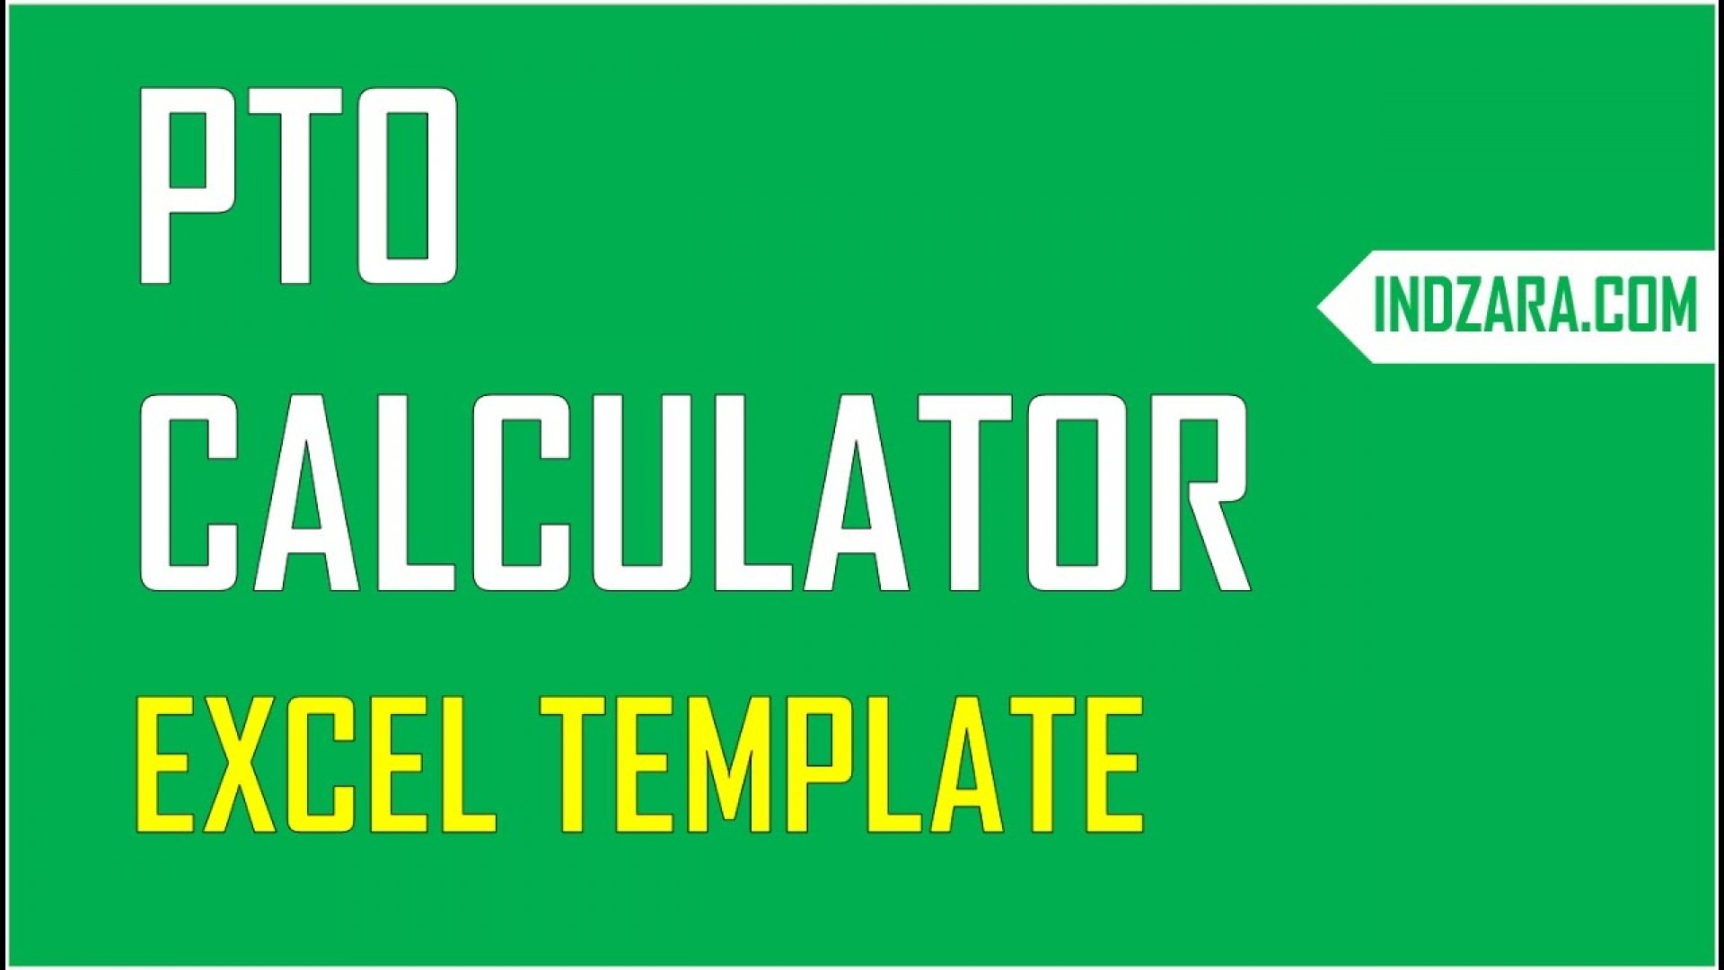 Pto Calculator Spreadsheet In 005 Excel Pto Tracker Template Maxresdefault ~ Ulyssesroom